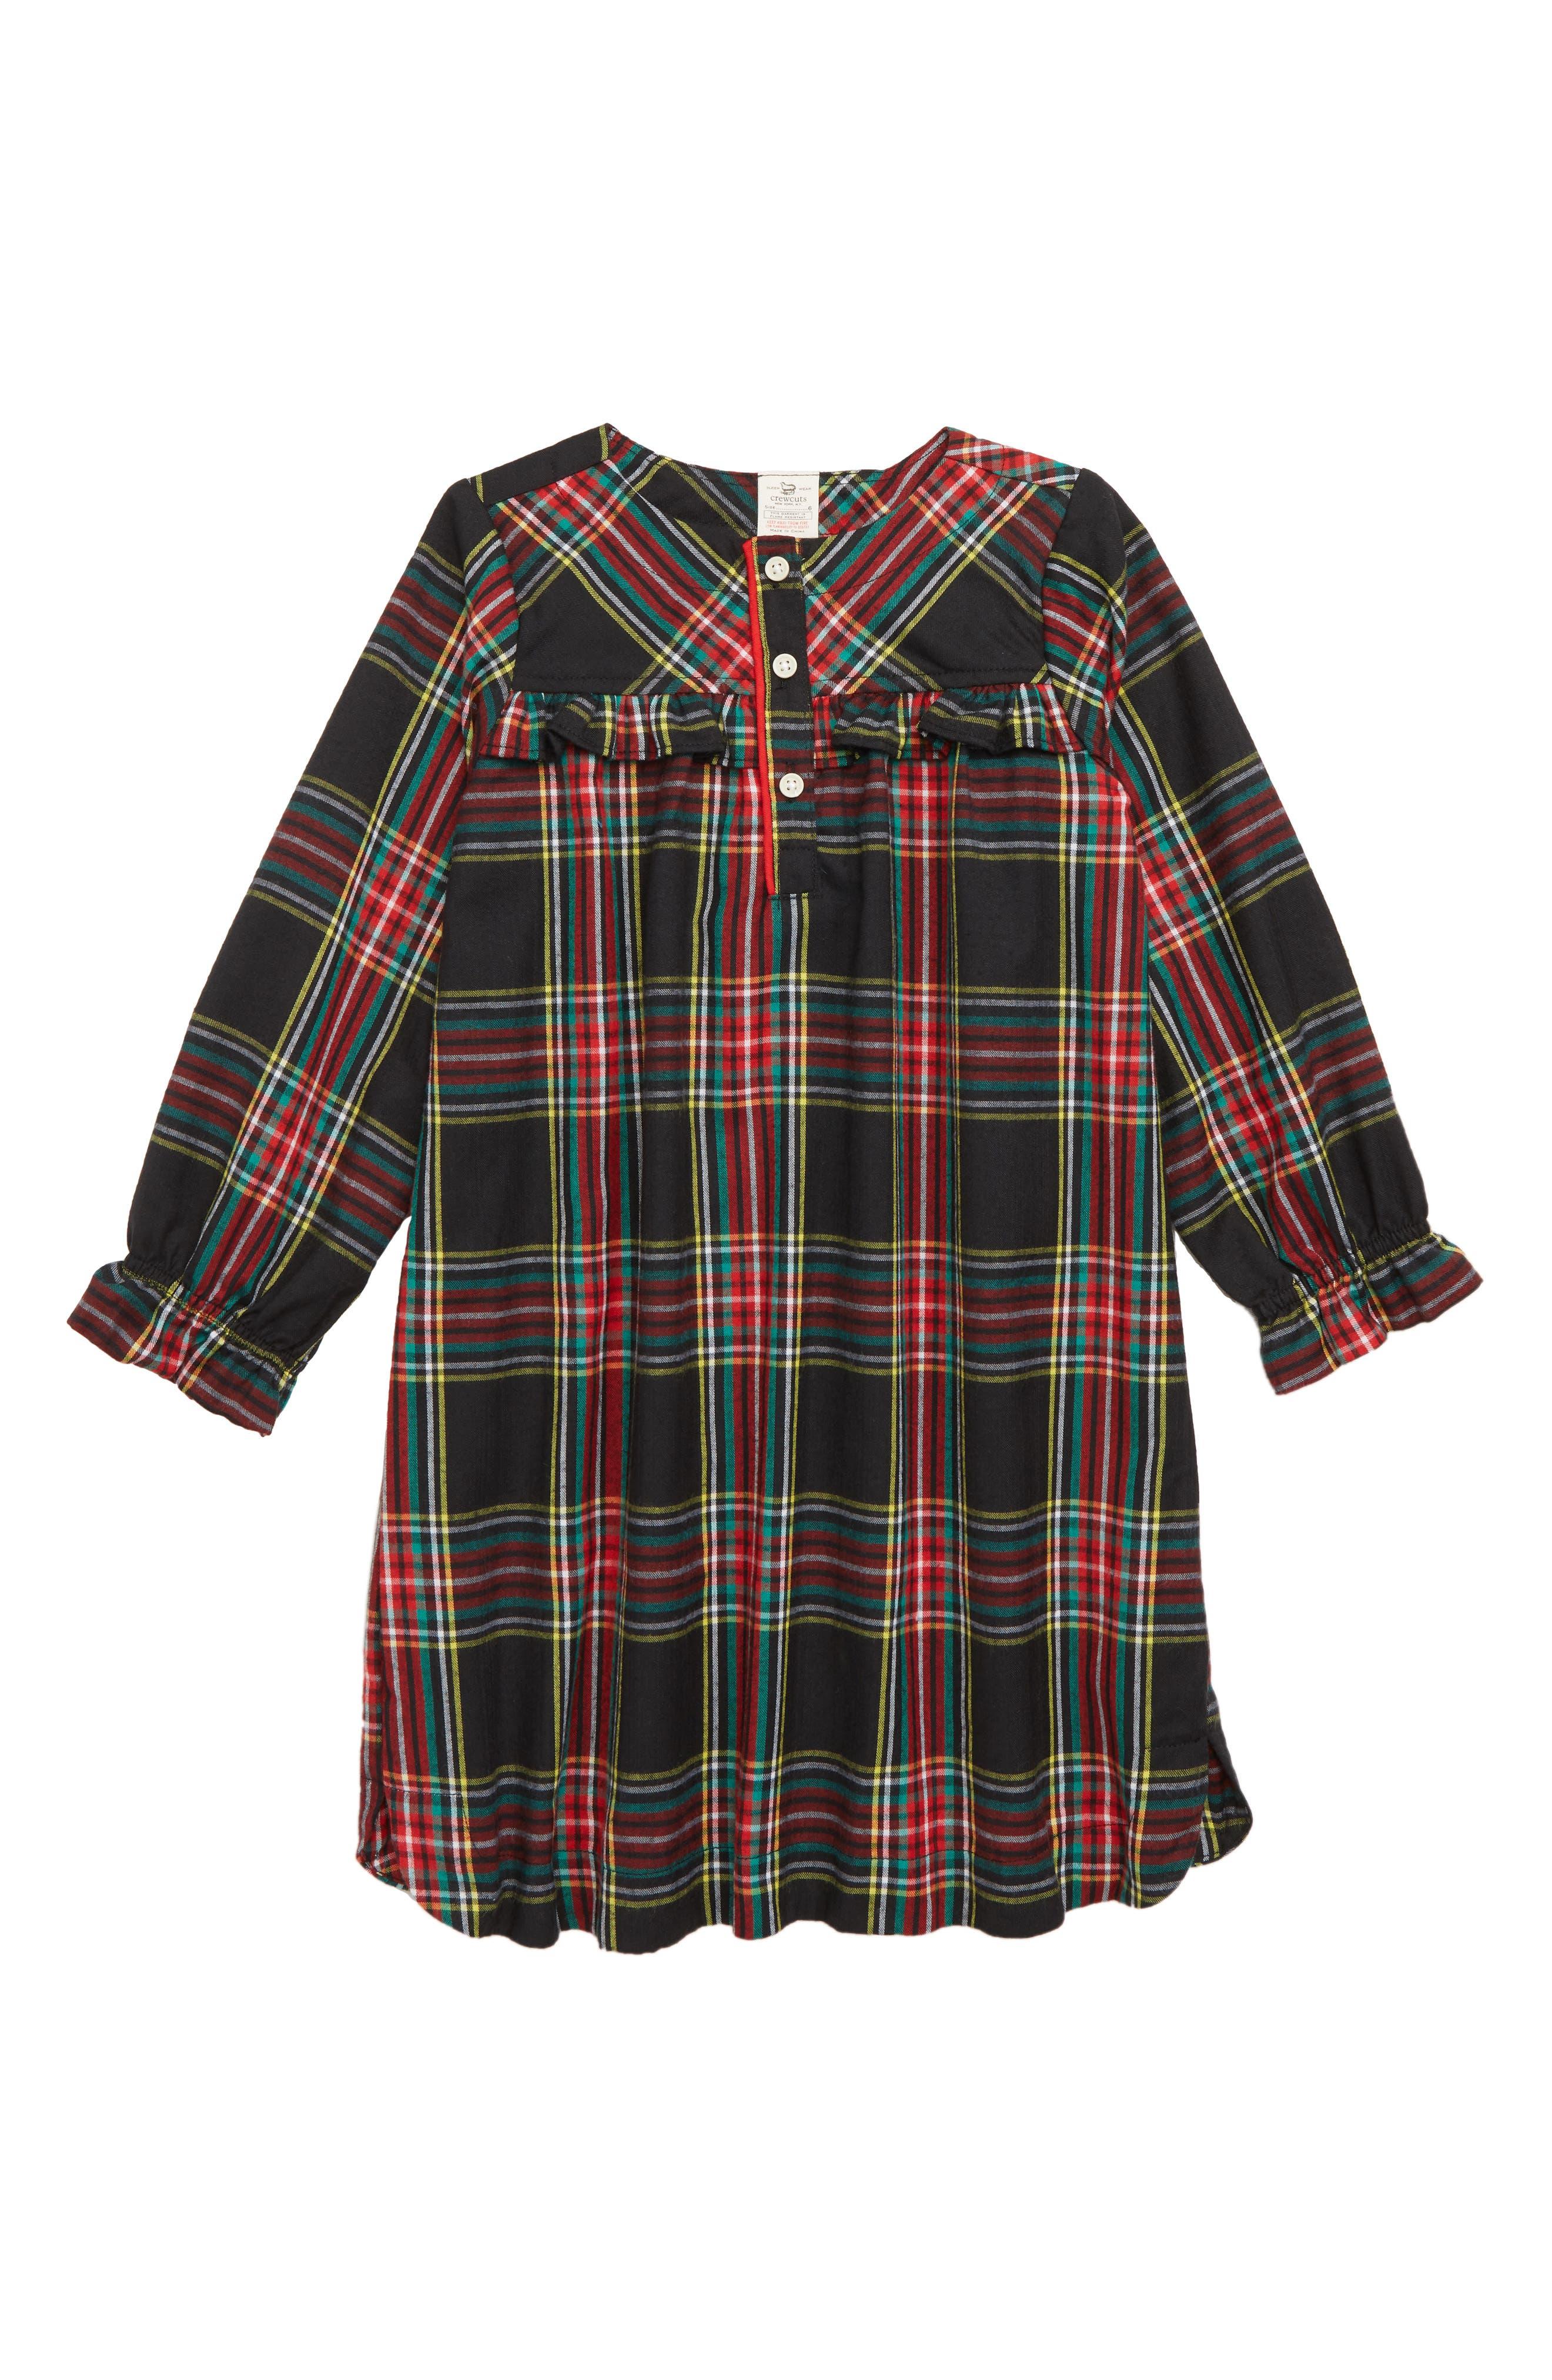 Girls Crewcuts By Jcrew Stewart Black Tartan Flannel Nightgown Size 10  None